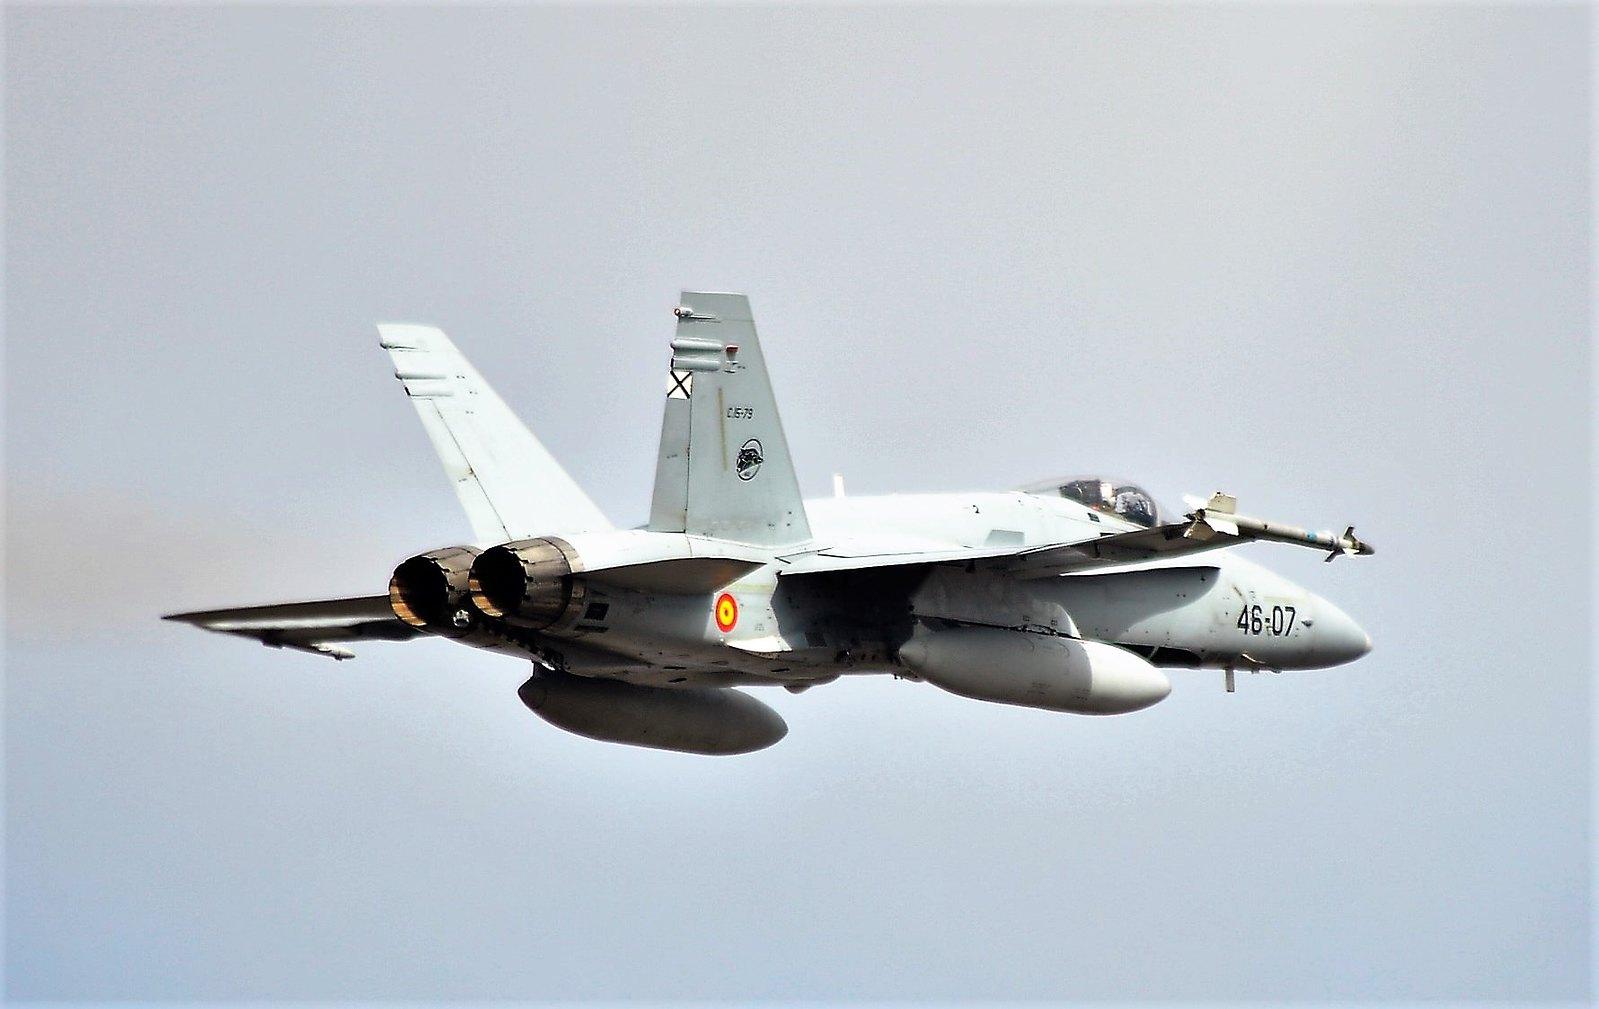 [url=https://flic.kr/p/QFoztz][img]https://farm1.staticflickr.com/264/31950873283_286f6675a5_h.jpg[/img][/url][url=https://flic.kr/p/QFoztz]Ejercicio Dissimilar Air Combat Training - DACT 2017 - Base Aérea de Gando[/url] by [url=https://www.flickr.com/photos/ejercitoaire/]Ejército del Aire Ministerio de Defensa España[/url], en Flickr